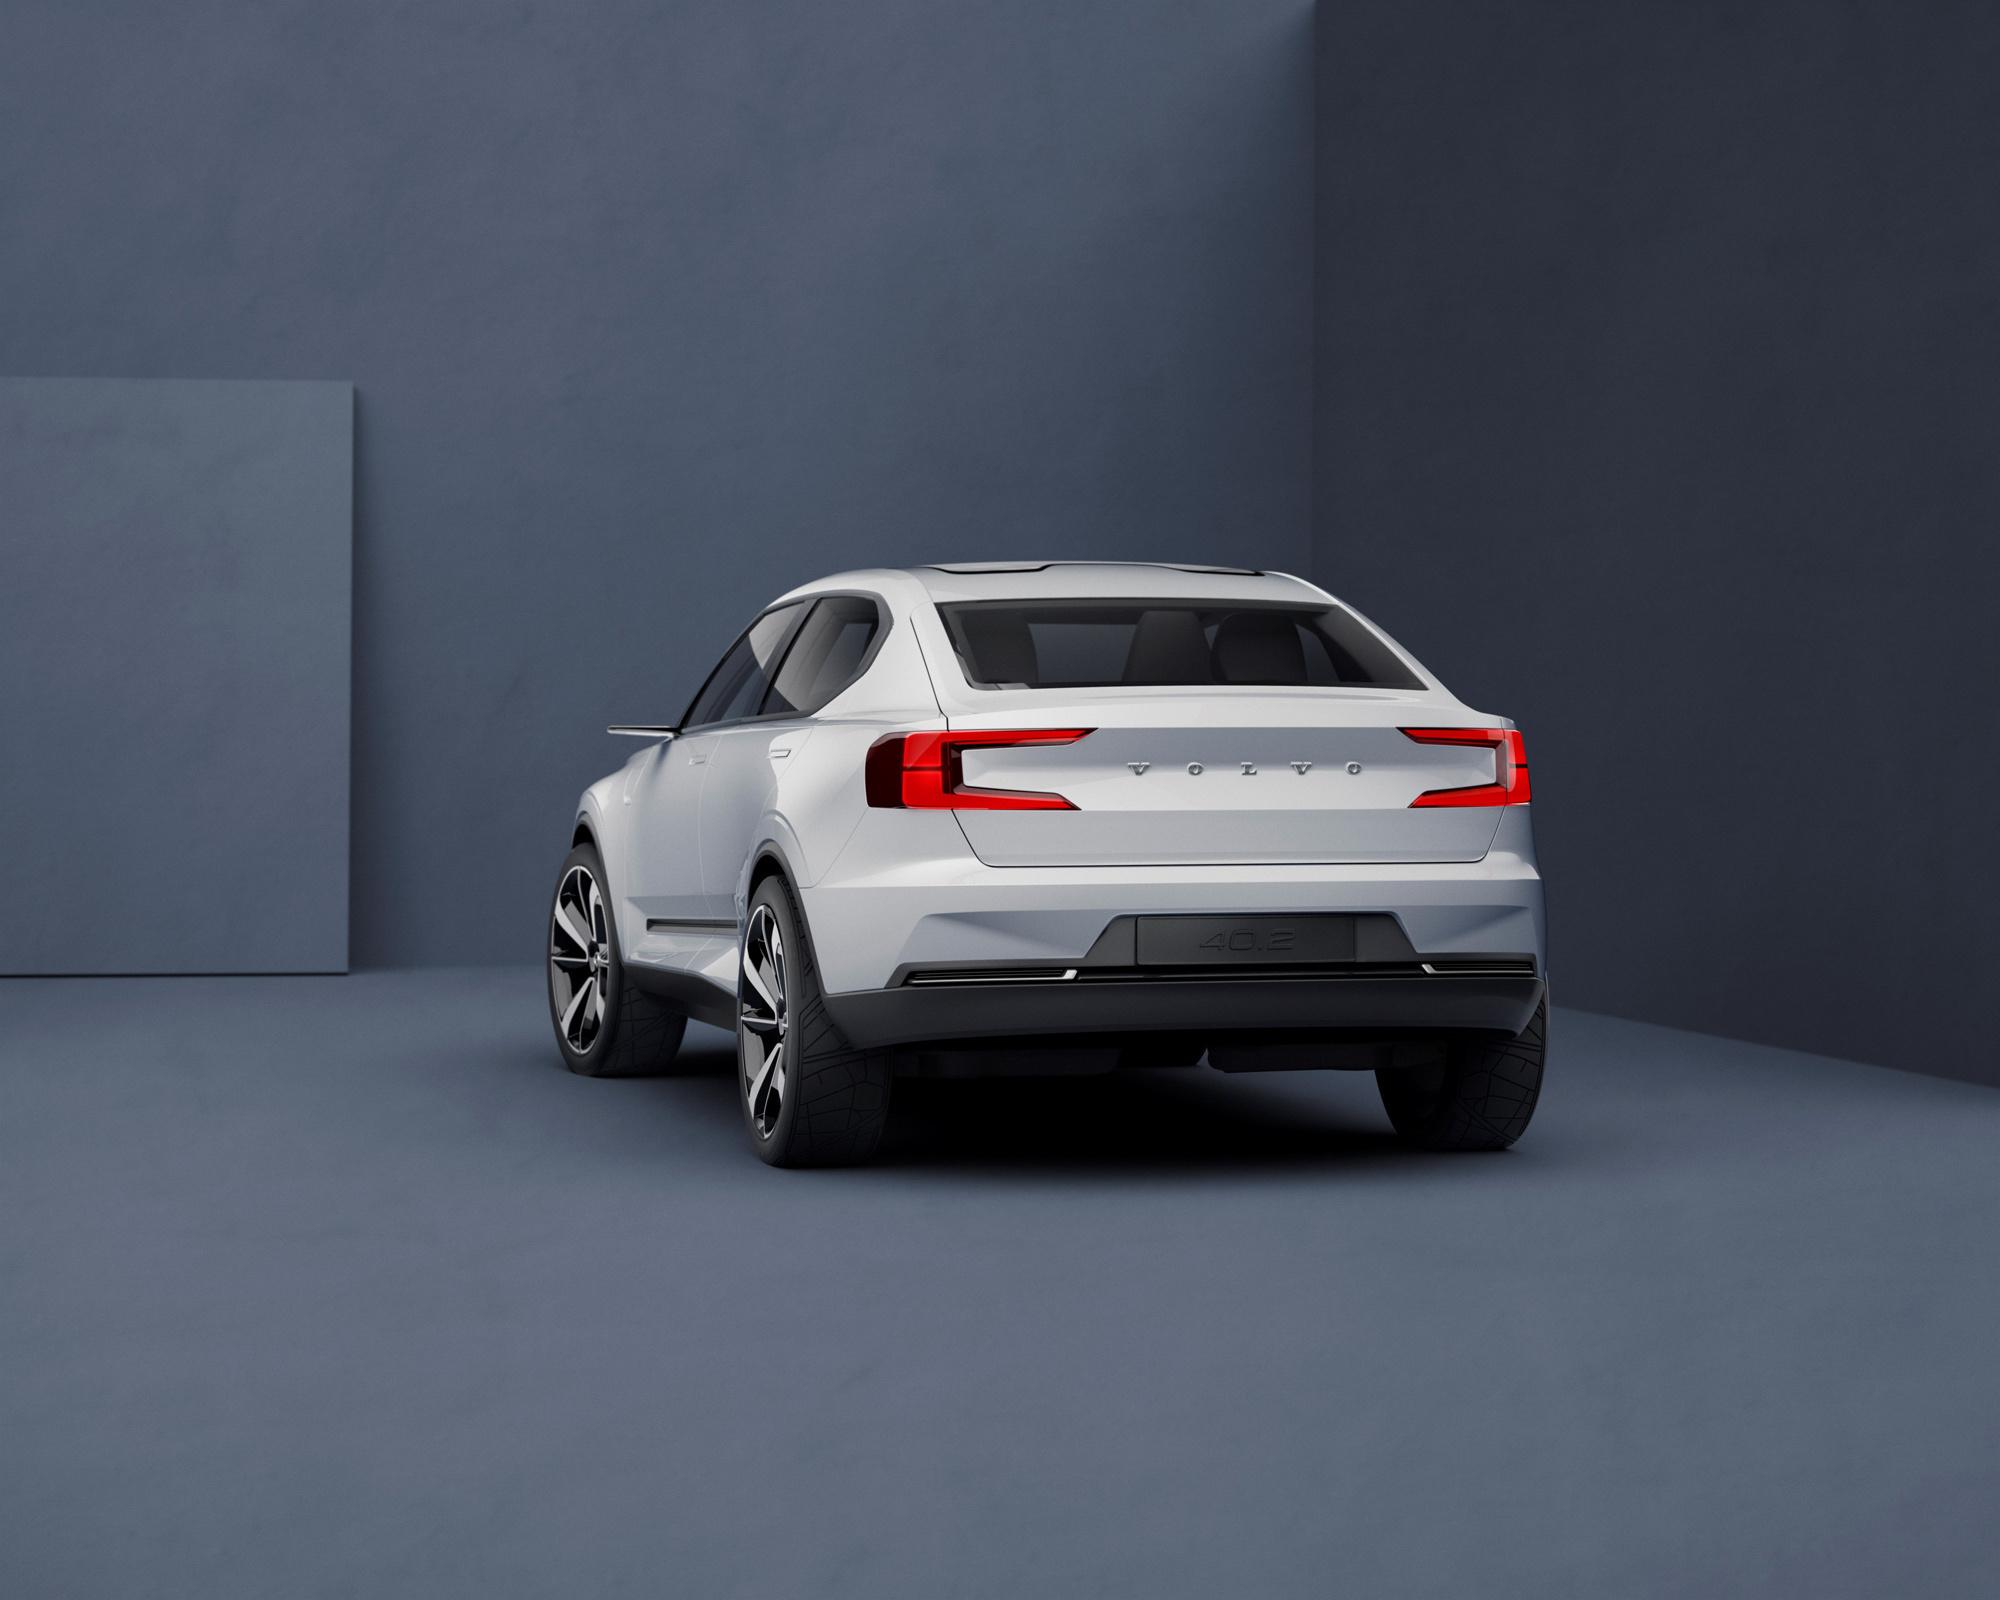 Volvo XC40 HD Wallpaper